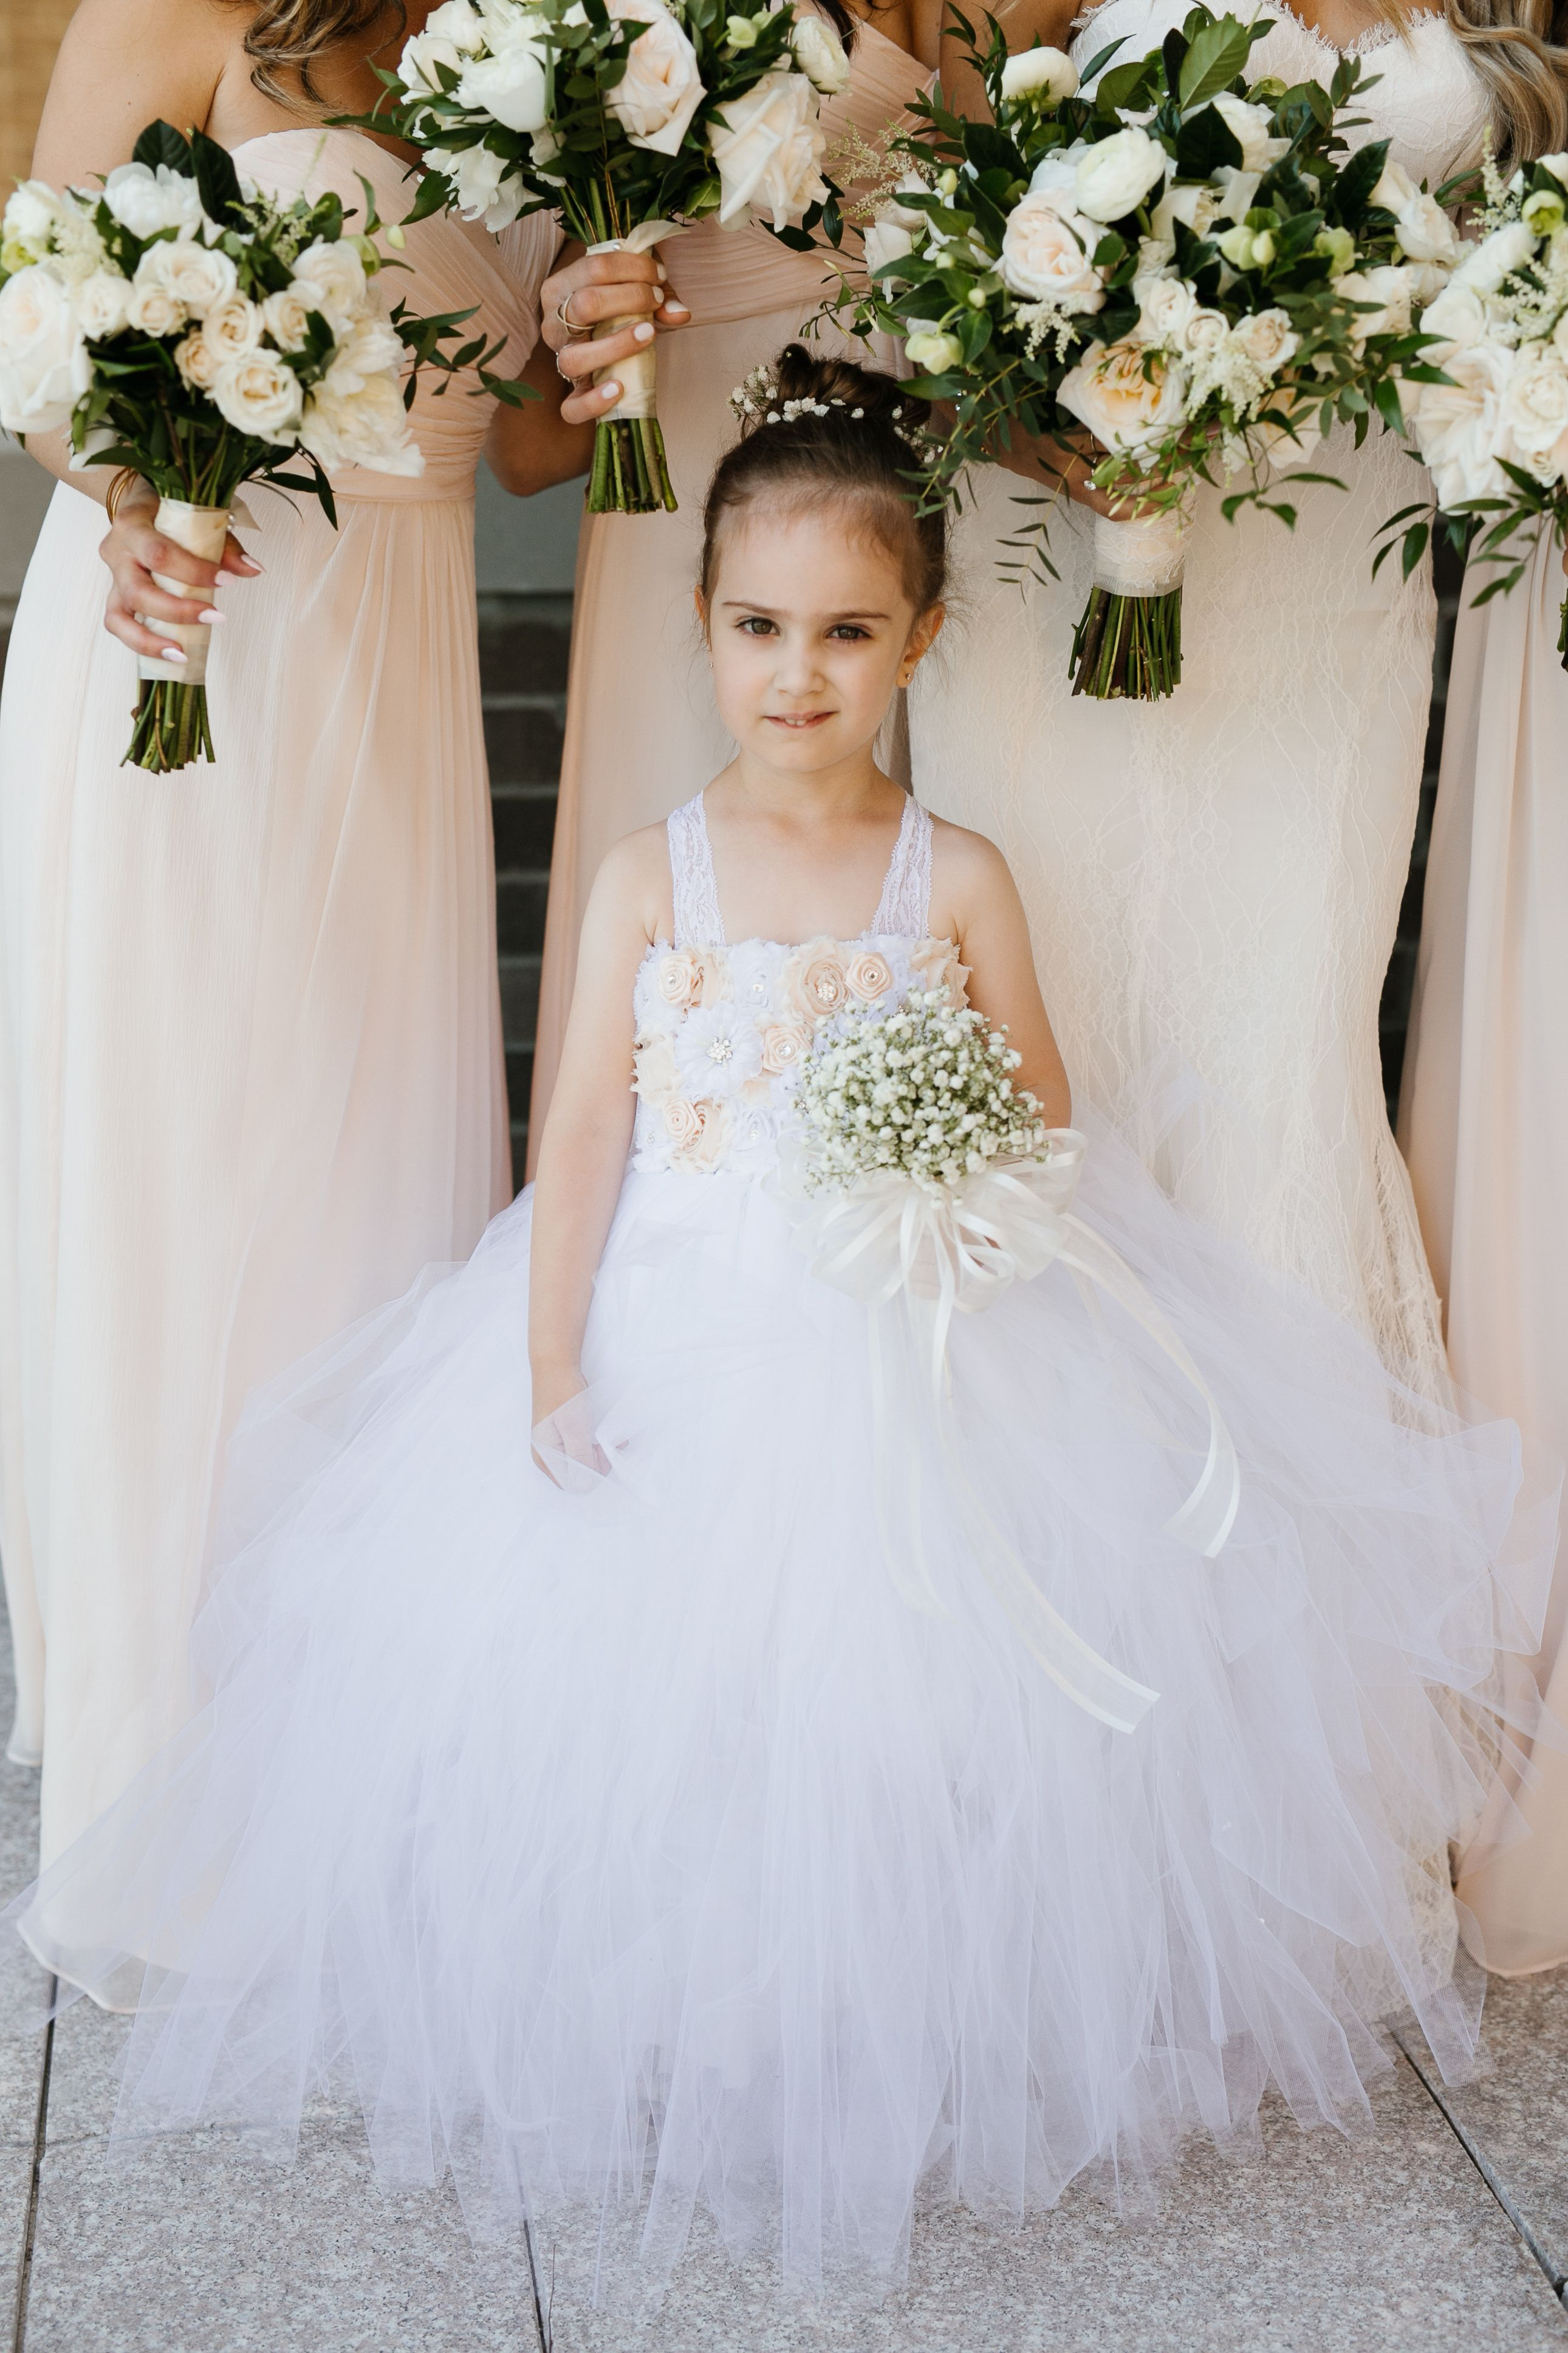 Modern elegance meet to create wedding magic little wedding wear